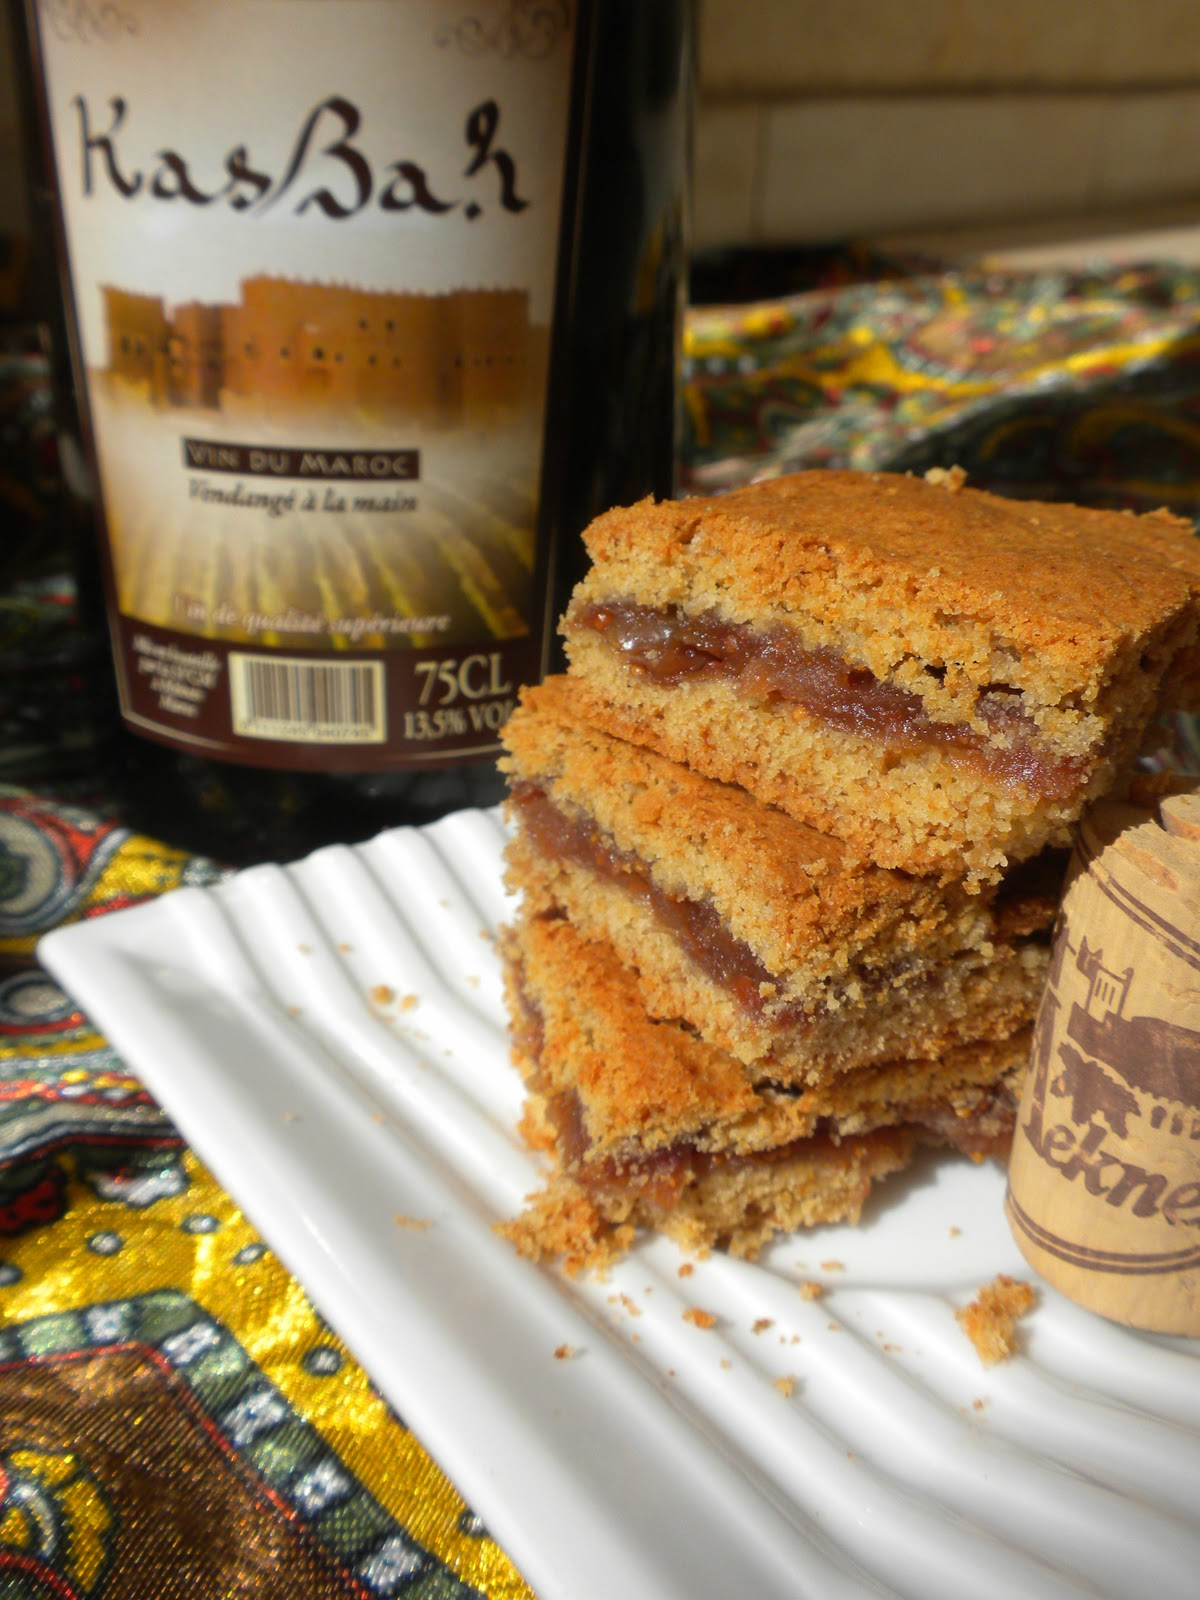 ... de Meknes & Grown-Up Fig Newtons (AKA: Anti-terrorism Hashuma Cookies